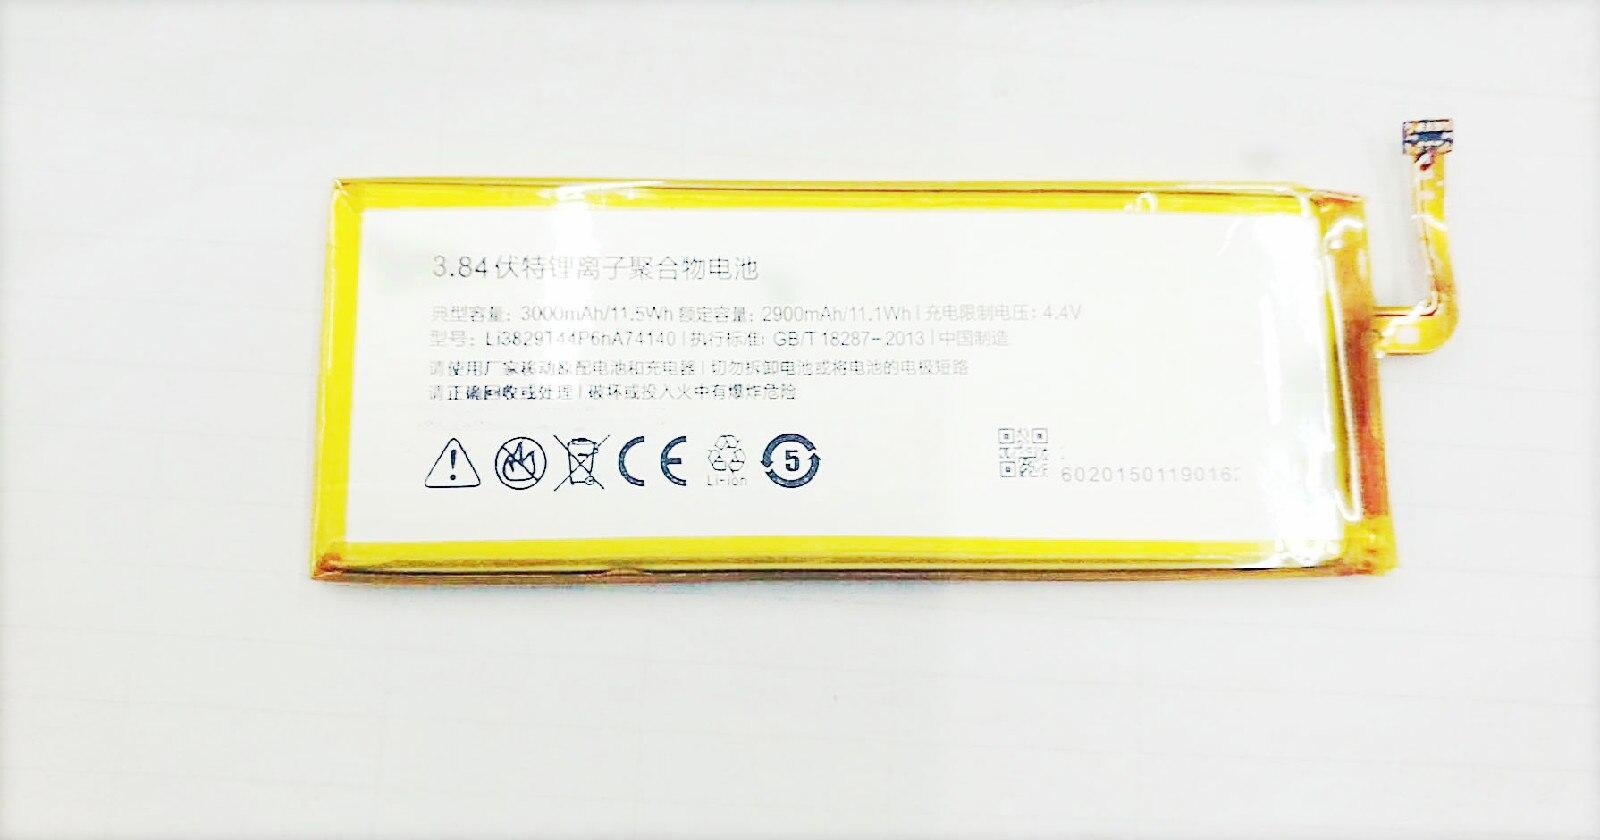 Westrock 3000mAh Li3829T44P6hA74140 battery for ZTE Nubia Z7 Z9 NX508J NX510J NX511J Z9 Max Plus Z9 mini cellphone ncp